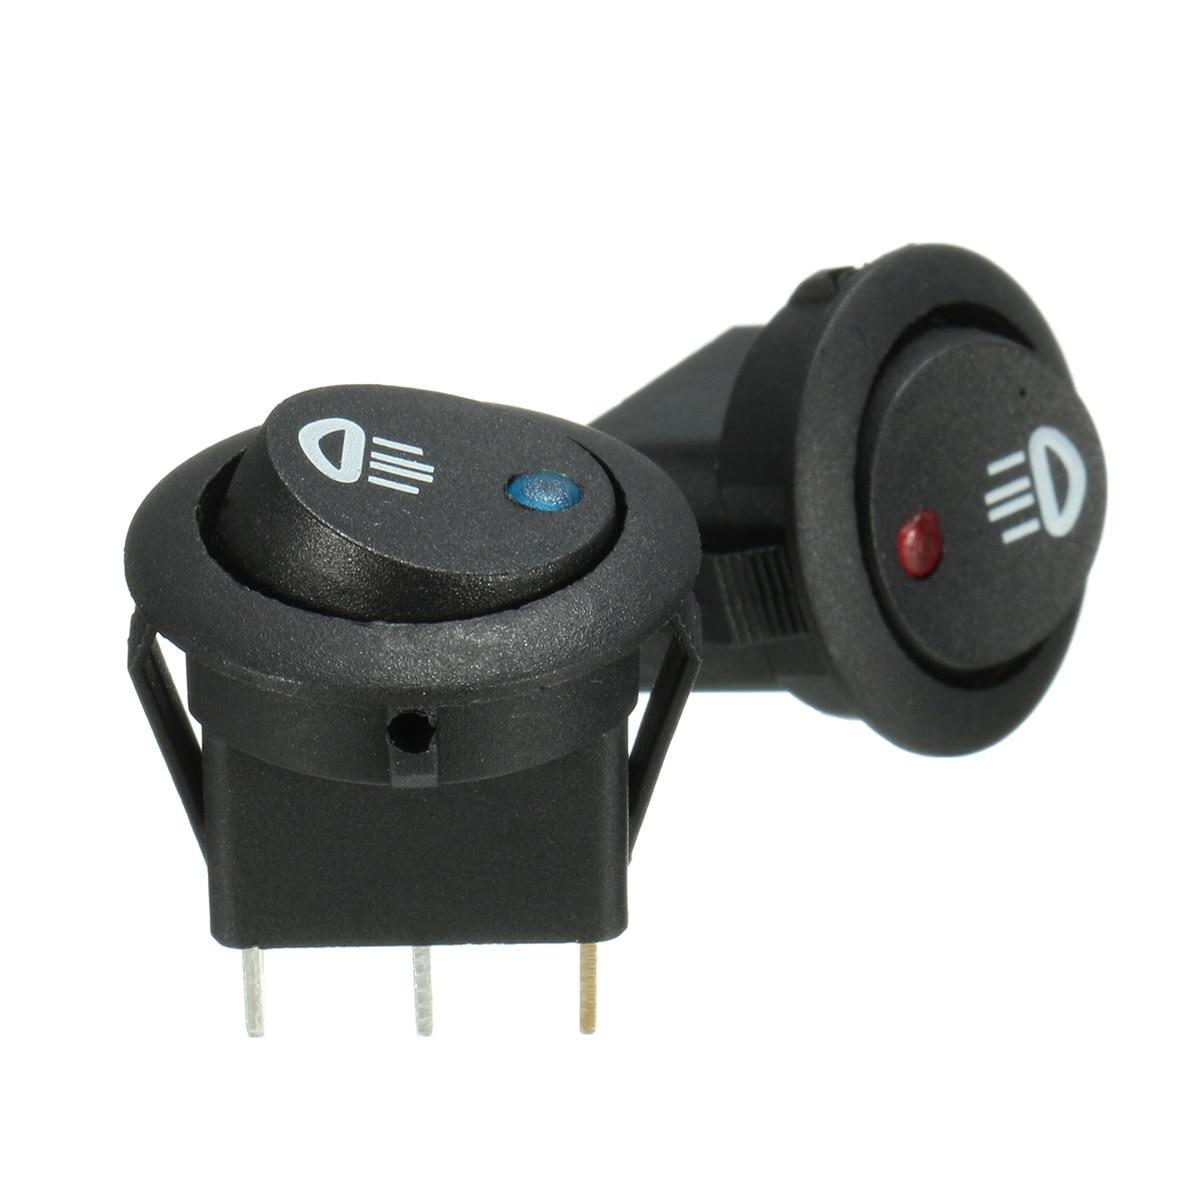 12V 20A 3Pins Car Round Toggle Rocker Switch SPST On/Off Dash Light For Car Van Illuminated LED Fog Light 23mm